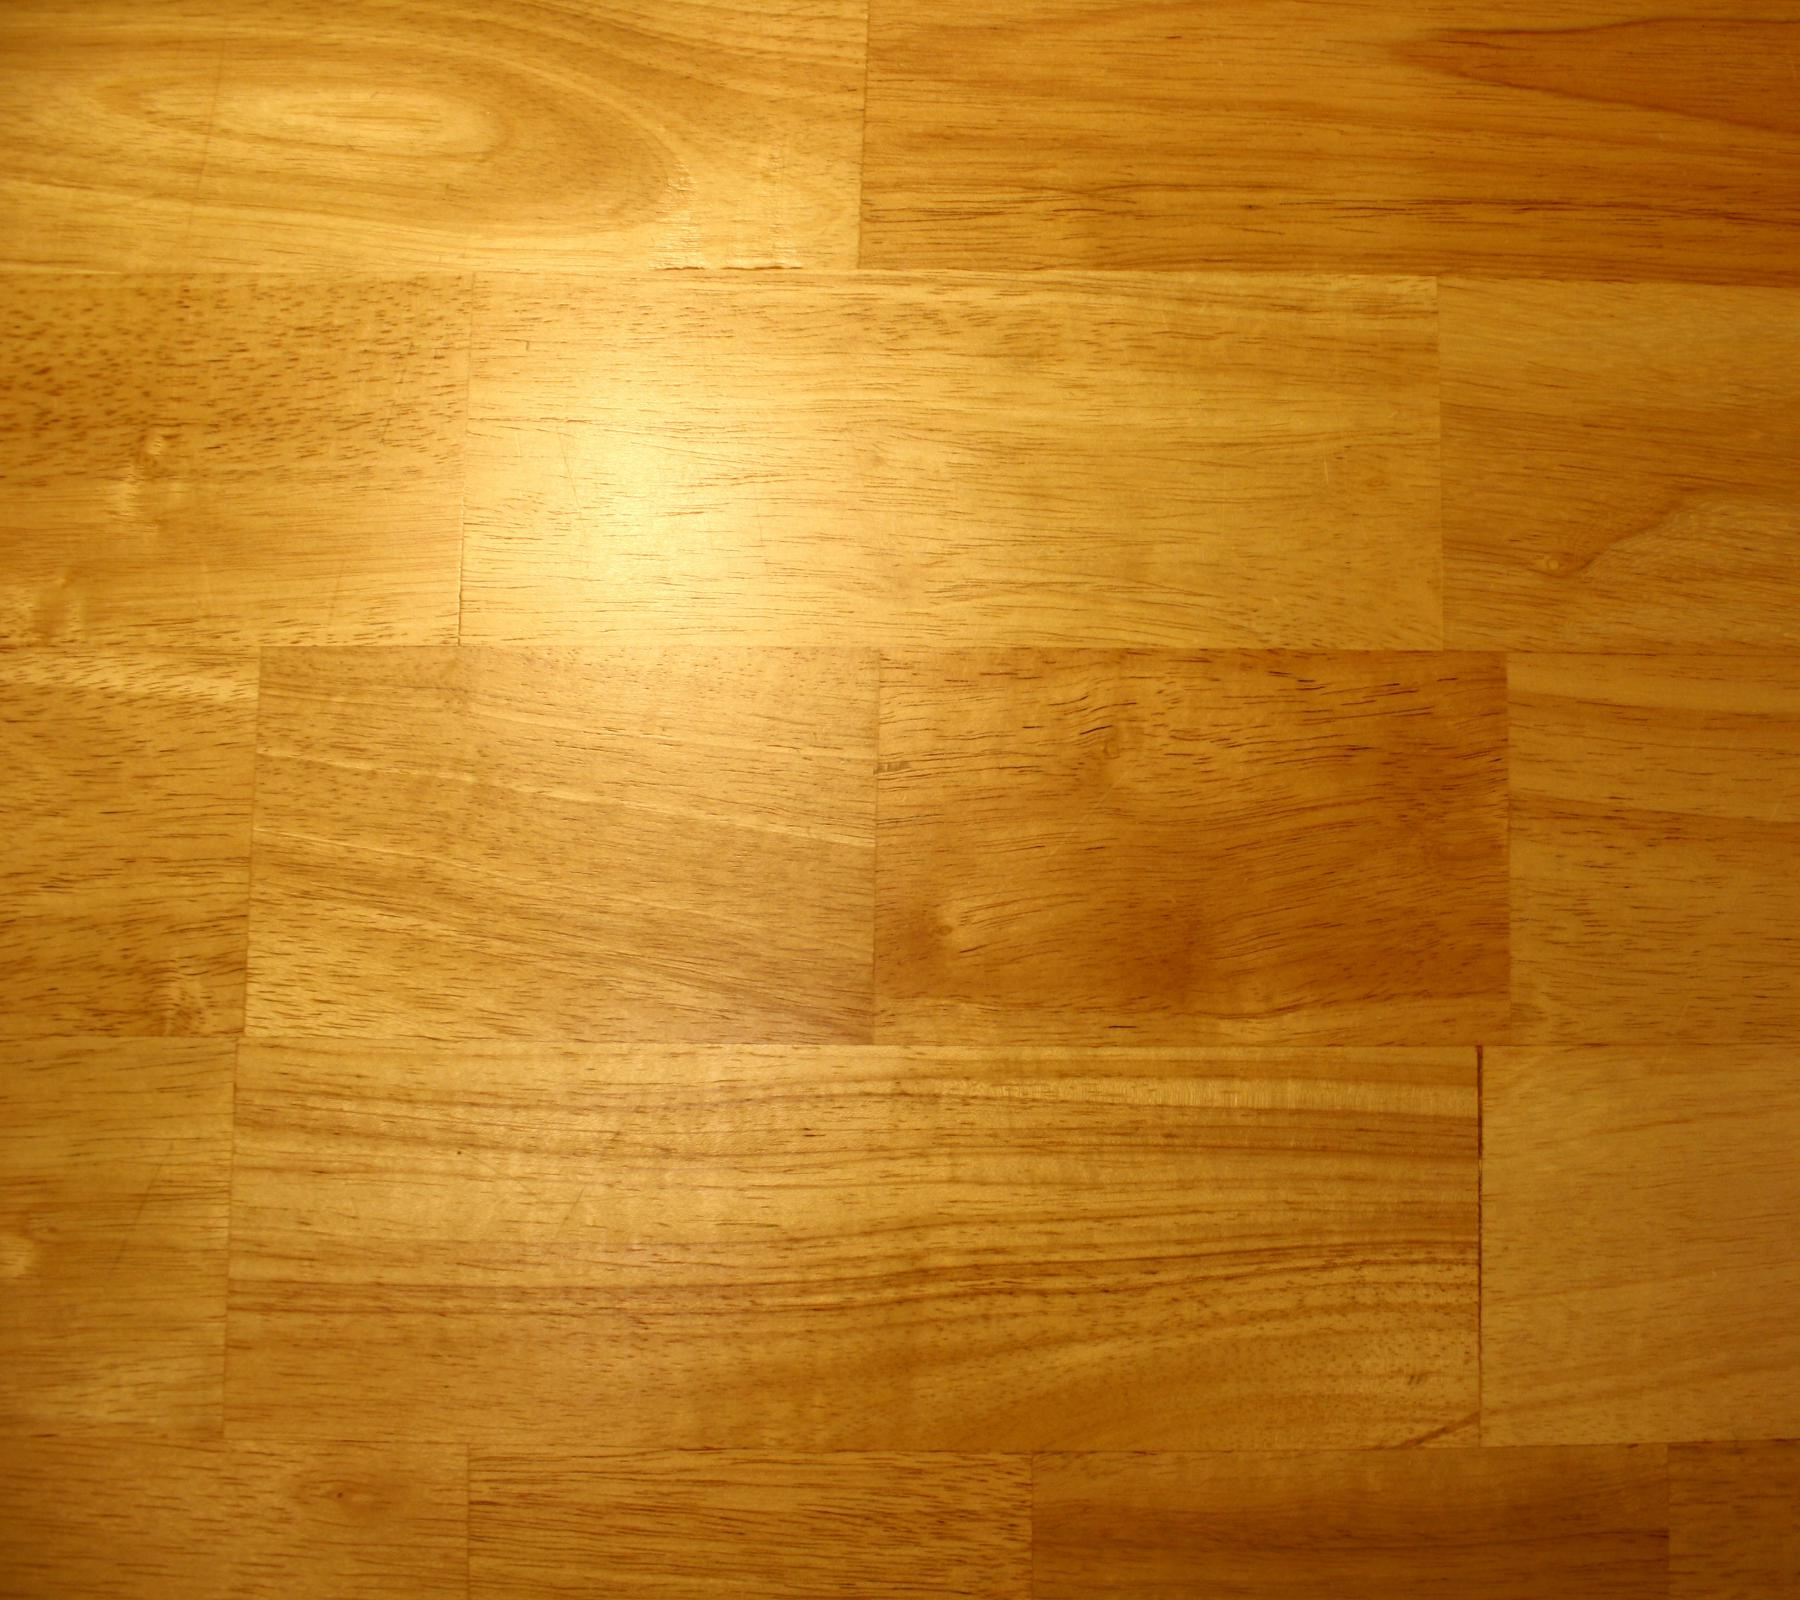 Hardwood Floors Background